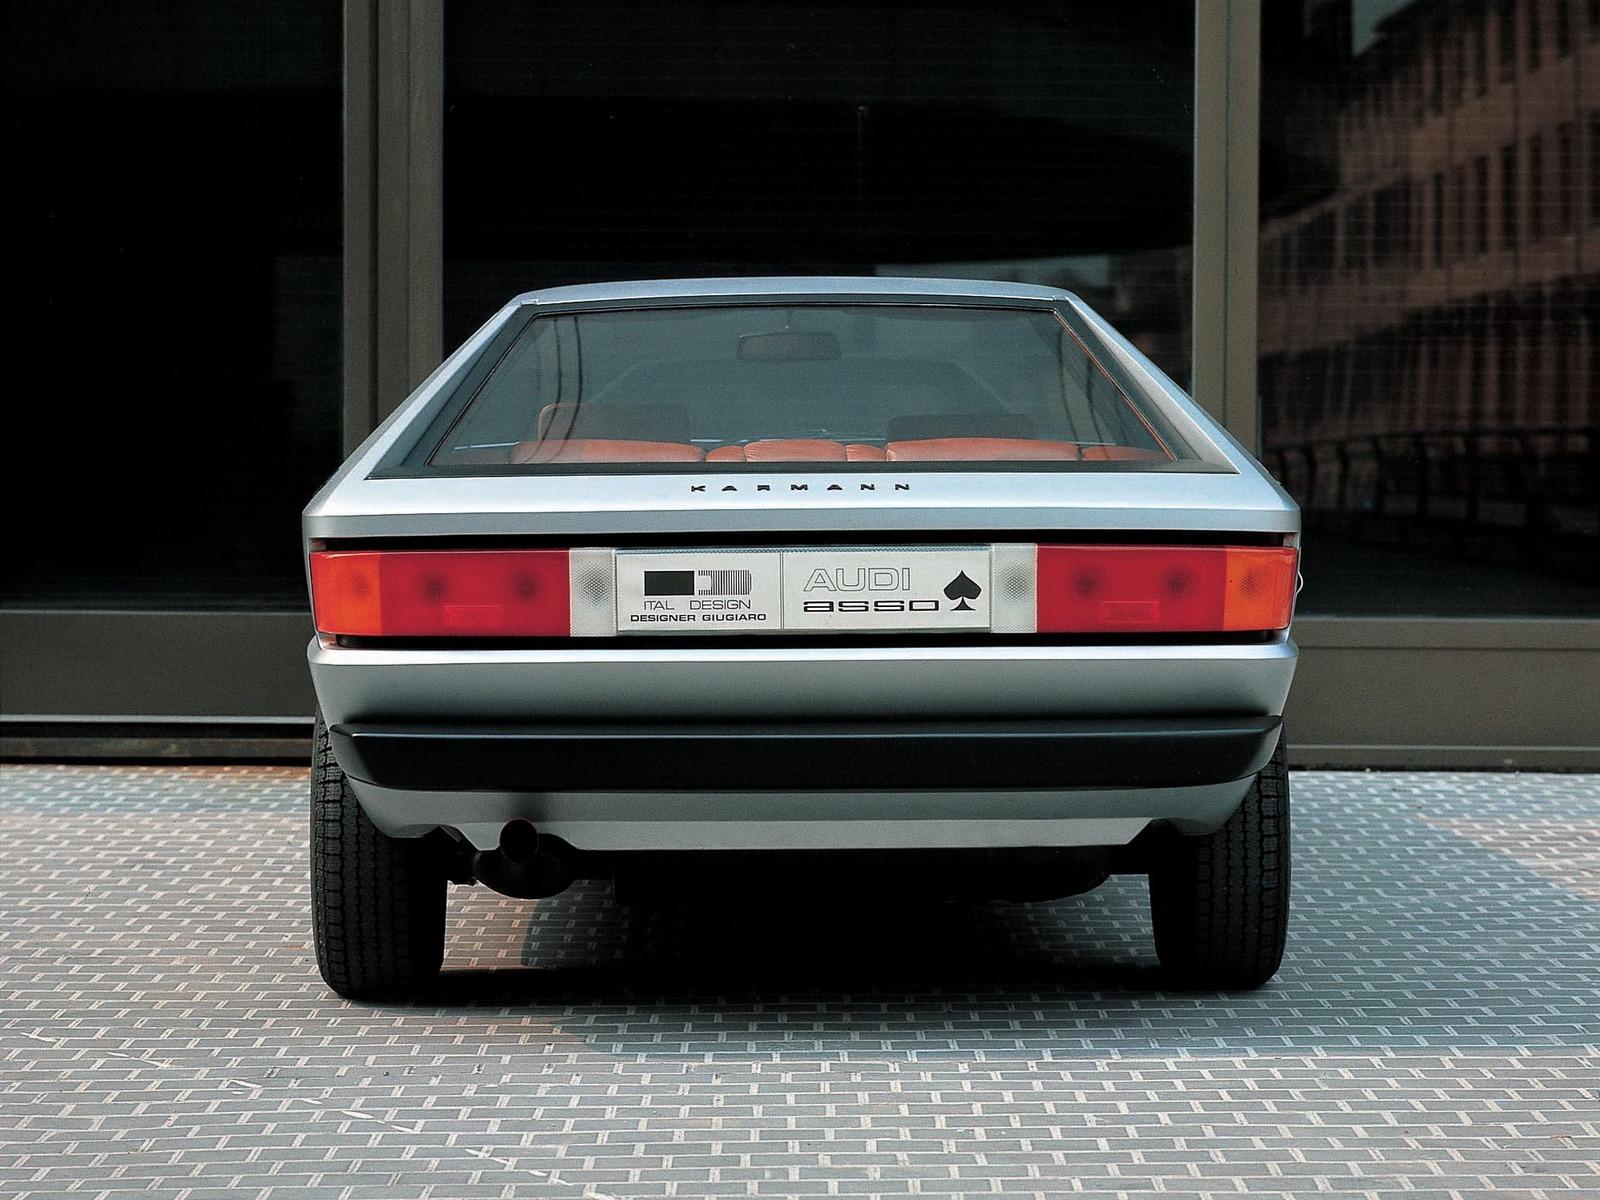 Top 10 Fastest Cars >> Audi Asso di Picche Concept (1973) - Old Concept Cars